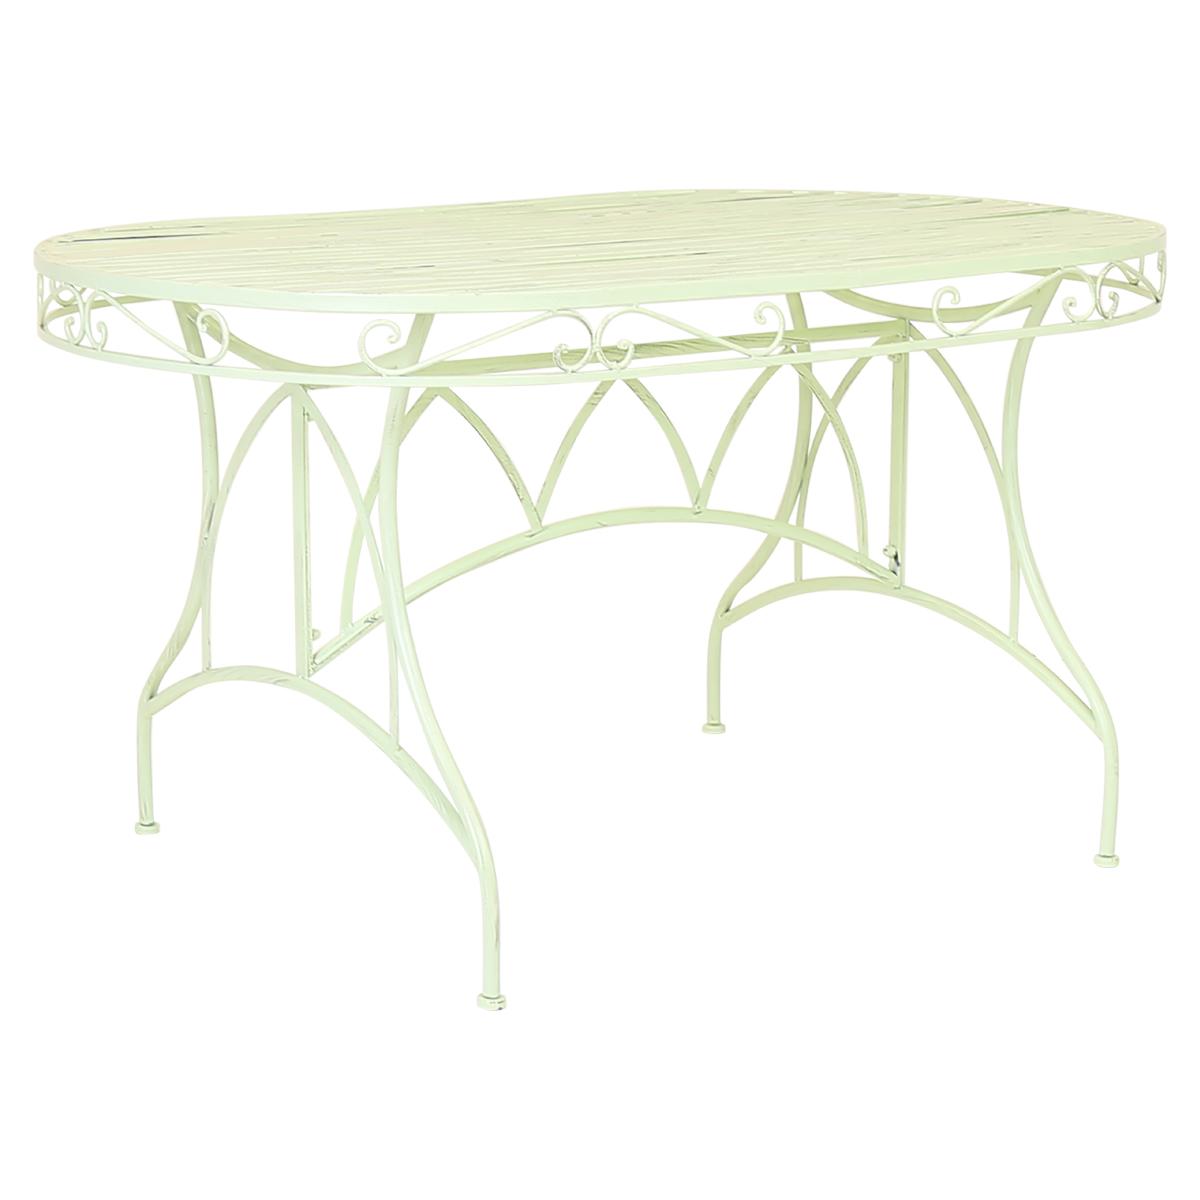 Charles Bentley Garden 7 Piece Wrought Iron Furniture